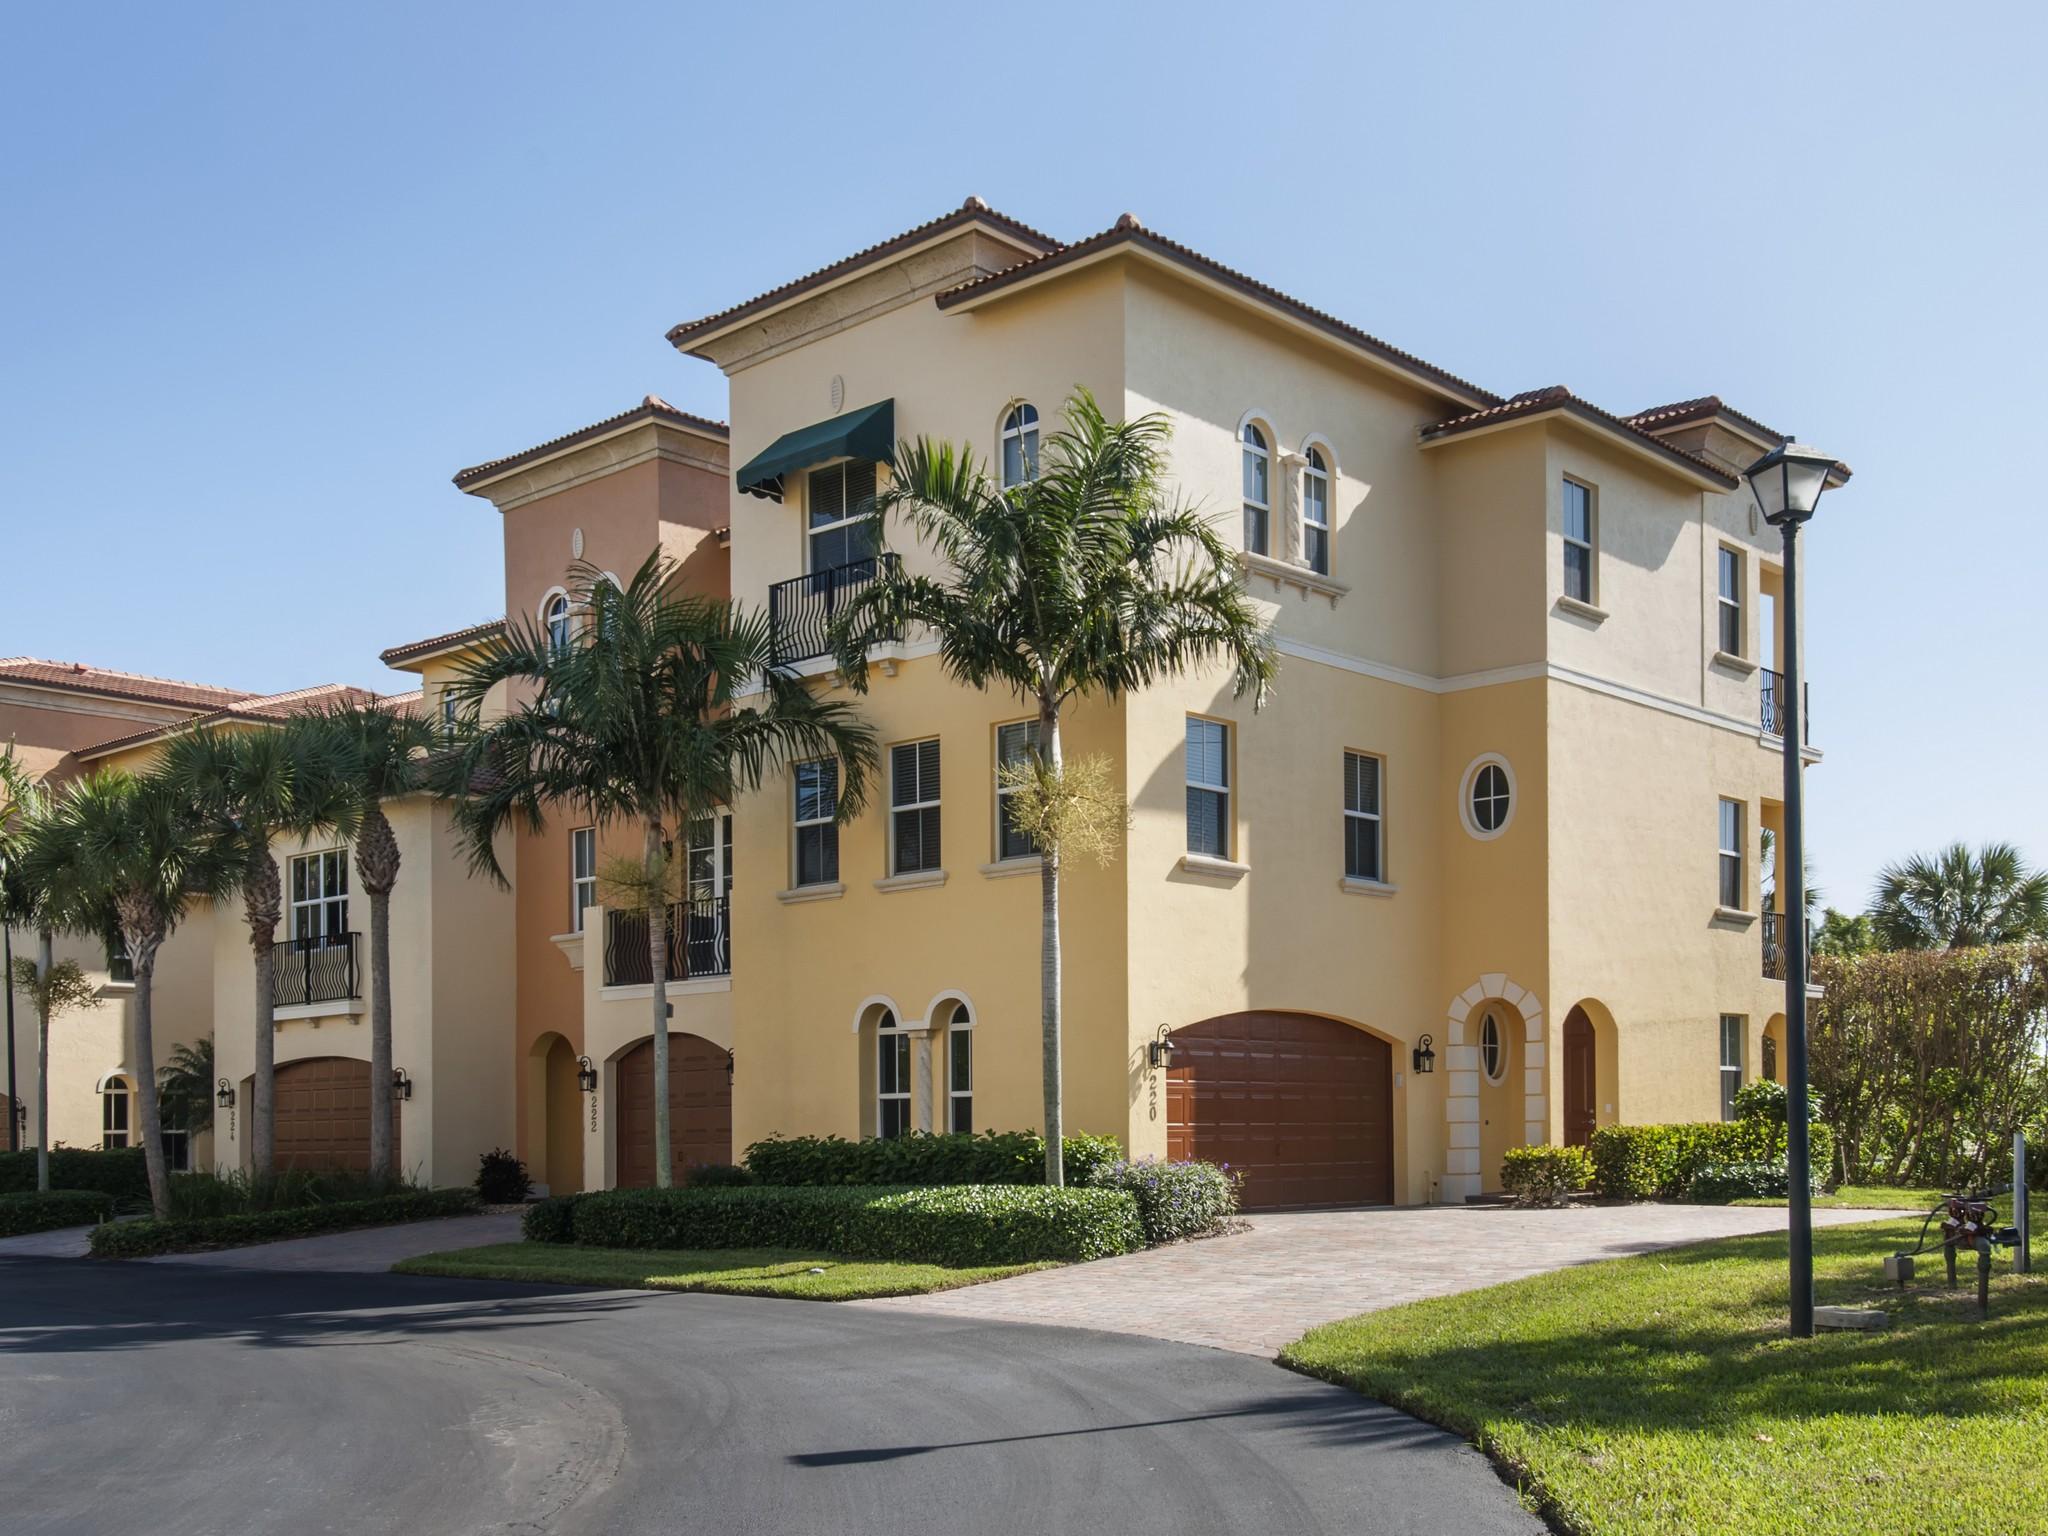 Nhà phố vì Bán tại Villa in Jensen Beach 220 Ocean Bay Drive Jensen Beach, Florida 34957 Hoa Kỳ